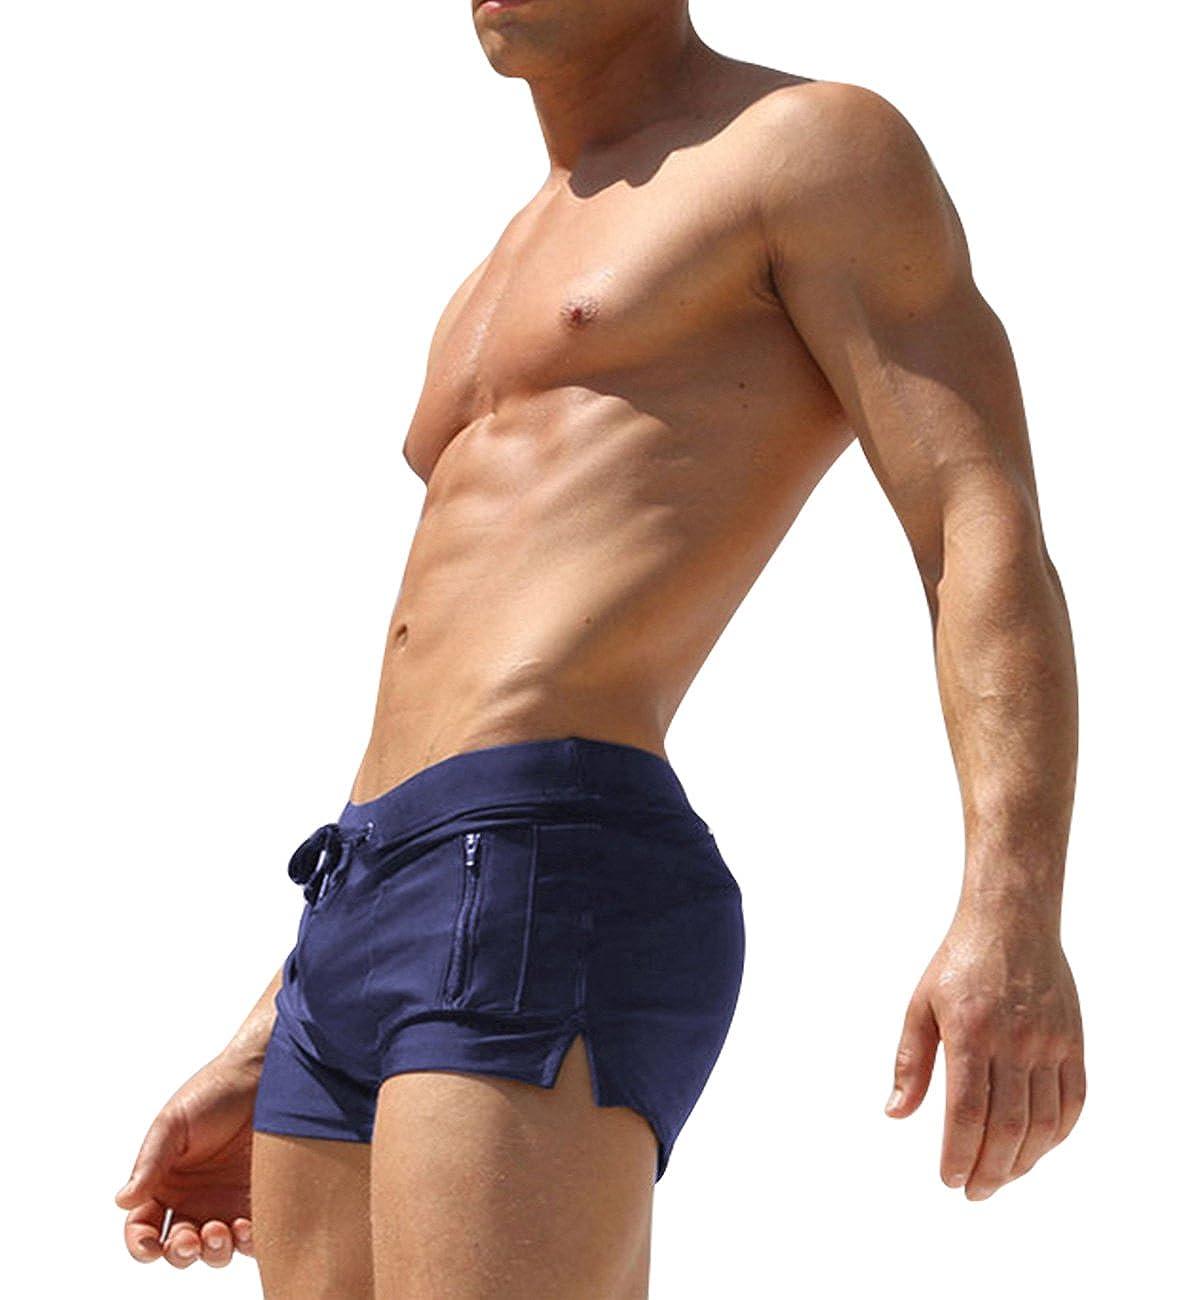 Feicuan Mens Comfort Swimming Trunk Swimwear Briefs L09